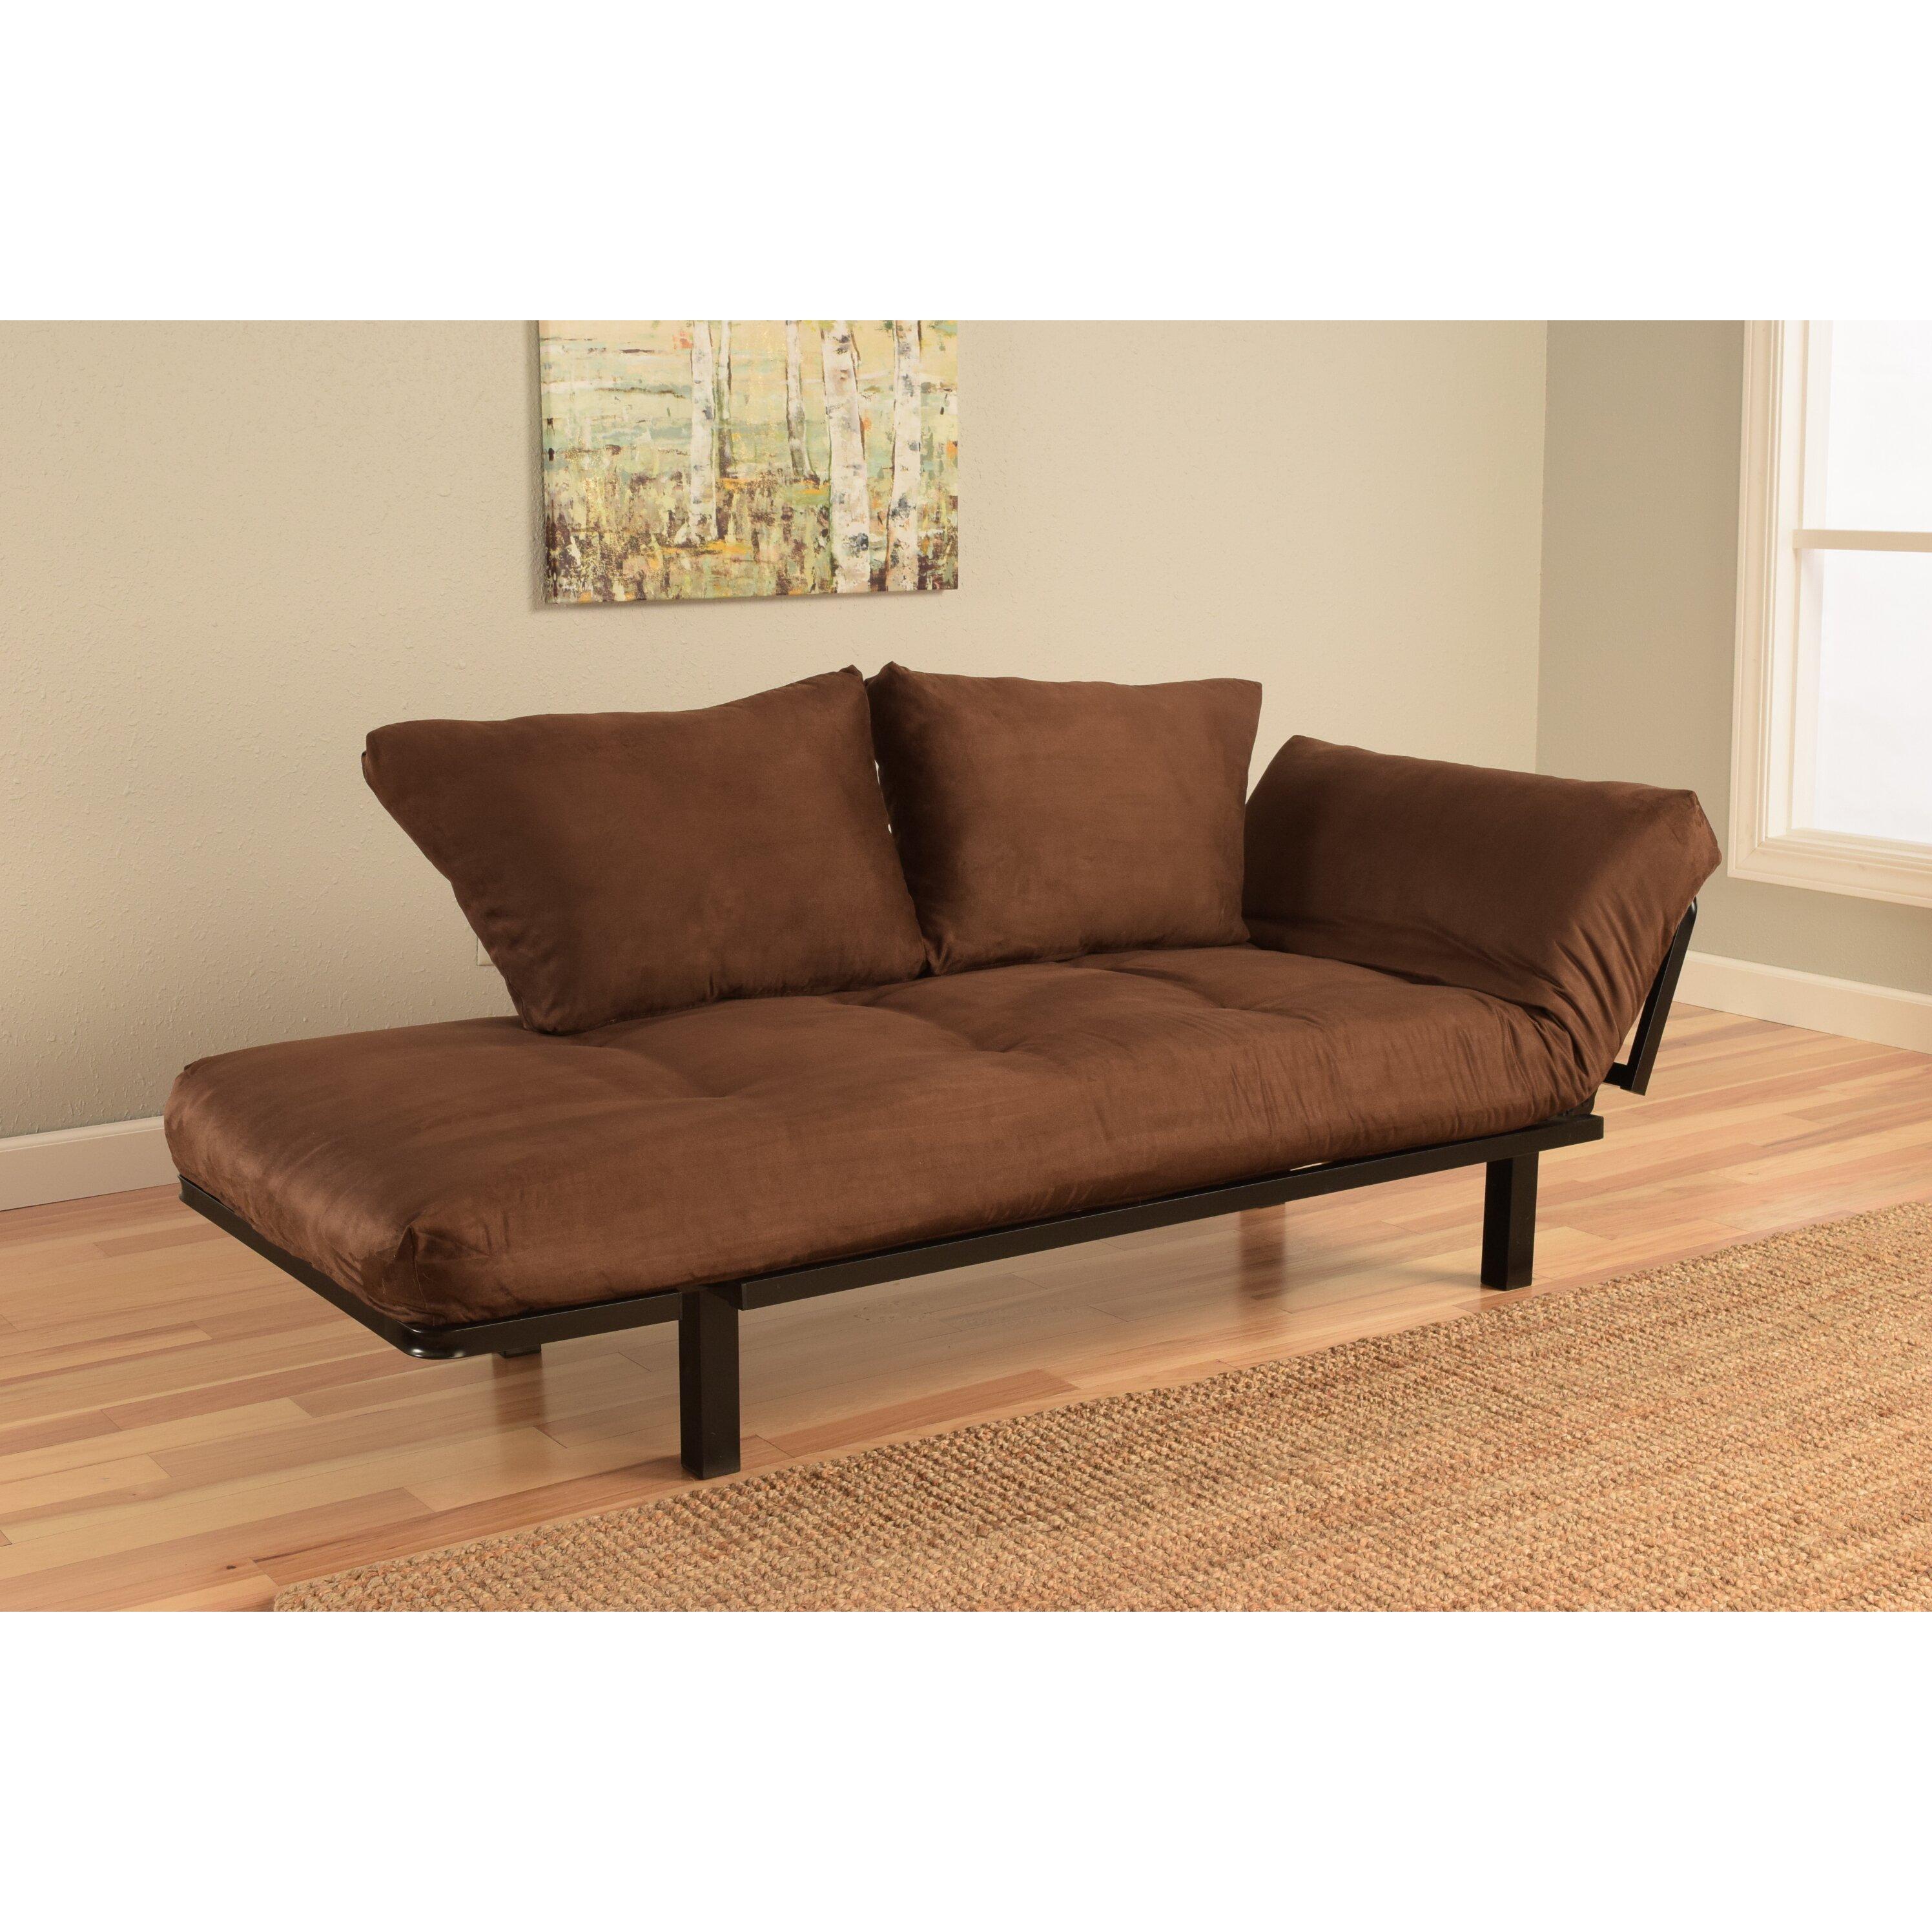 Kodiak furniture spacely convertible futon lounger for Sofa convertible 2 places